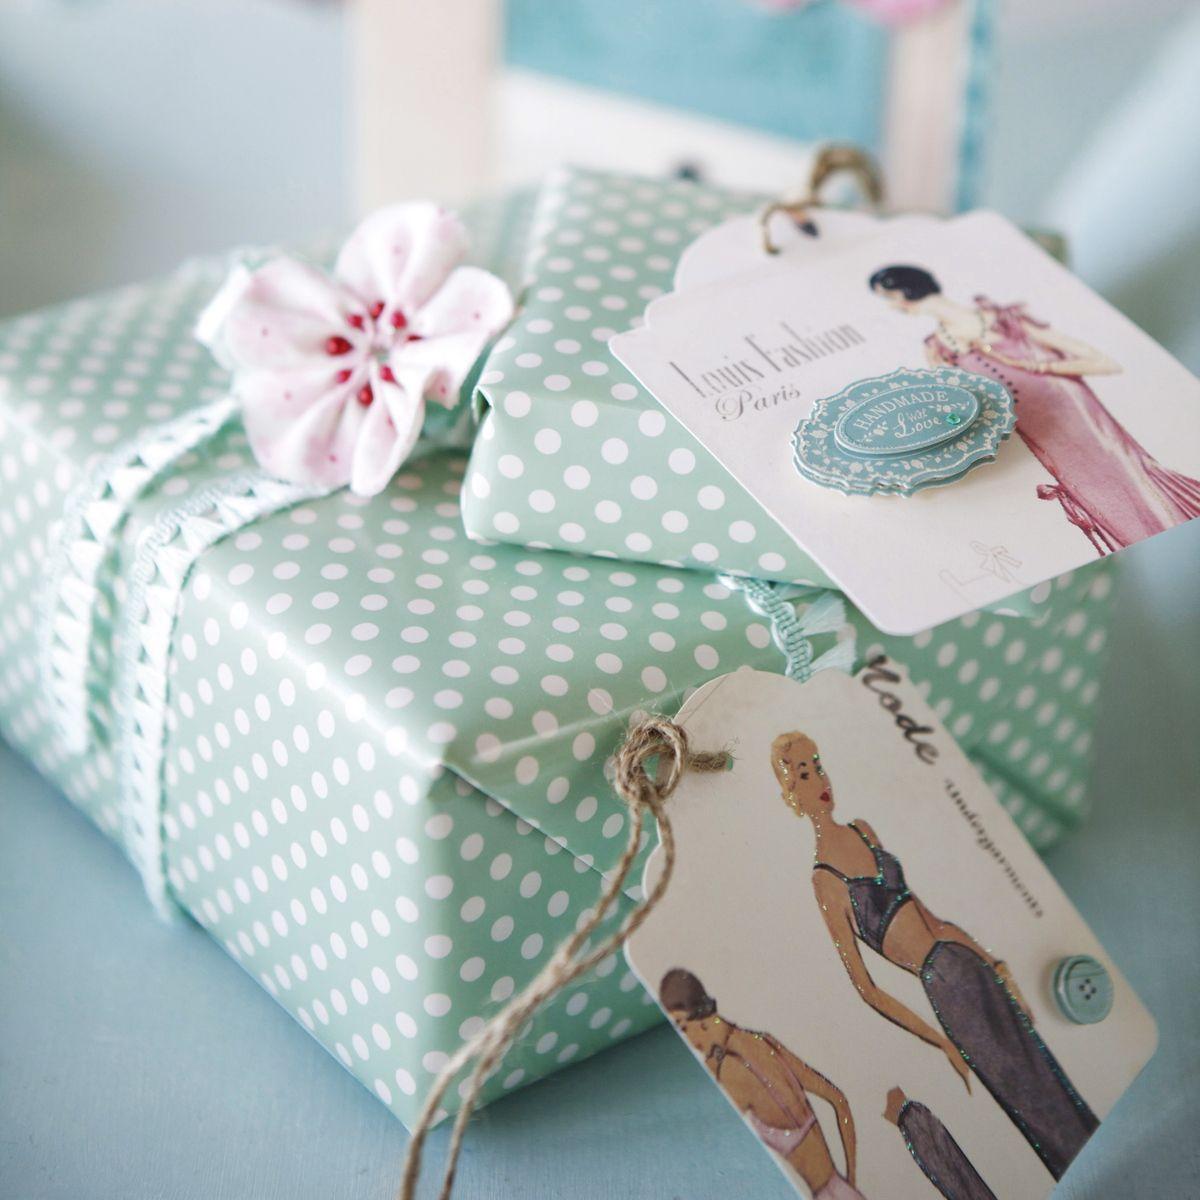 pin von sentimentaljunkie auf the art of gift wrapping. Black Bedroom Furniture Sets. Home Design Ideas